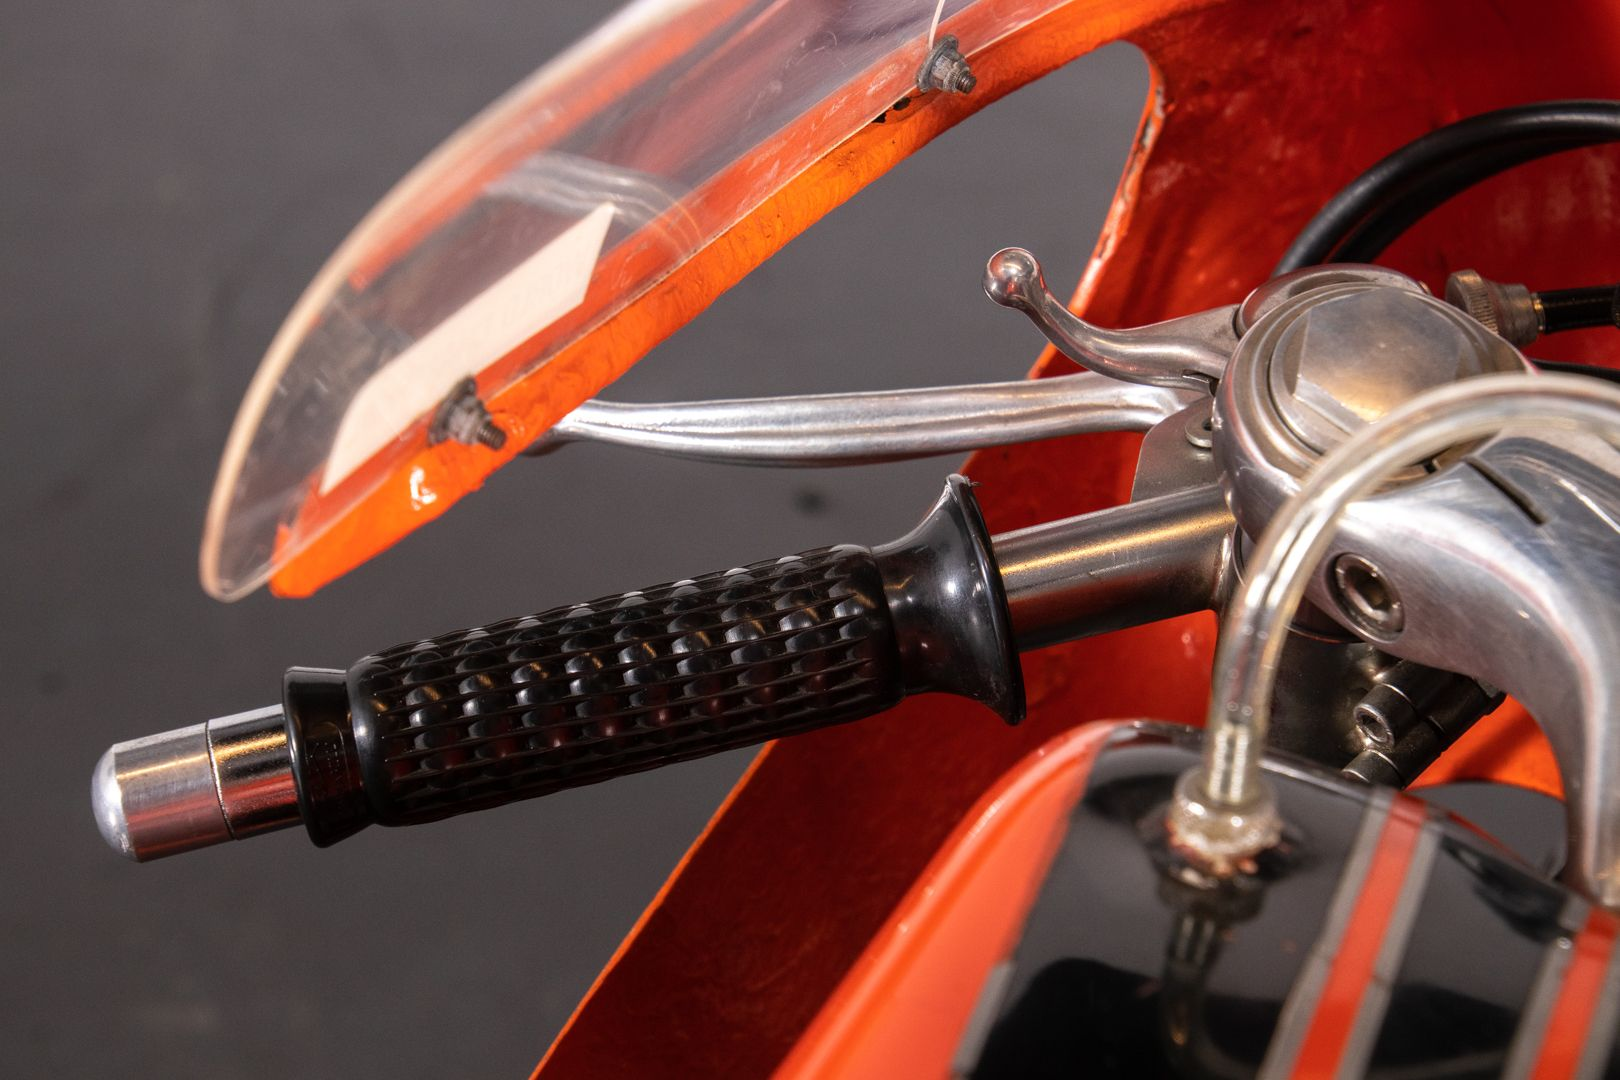 1974 HARLEY DAVIDSON 250 RR 51564